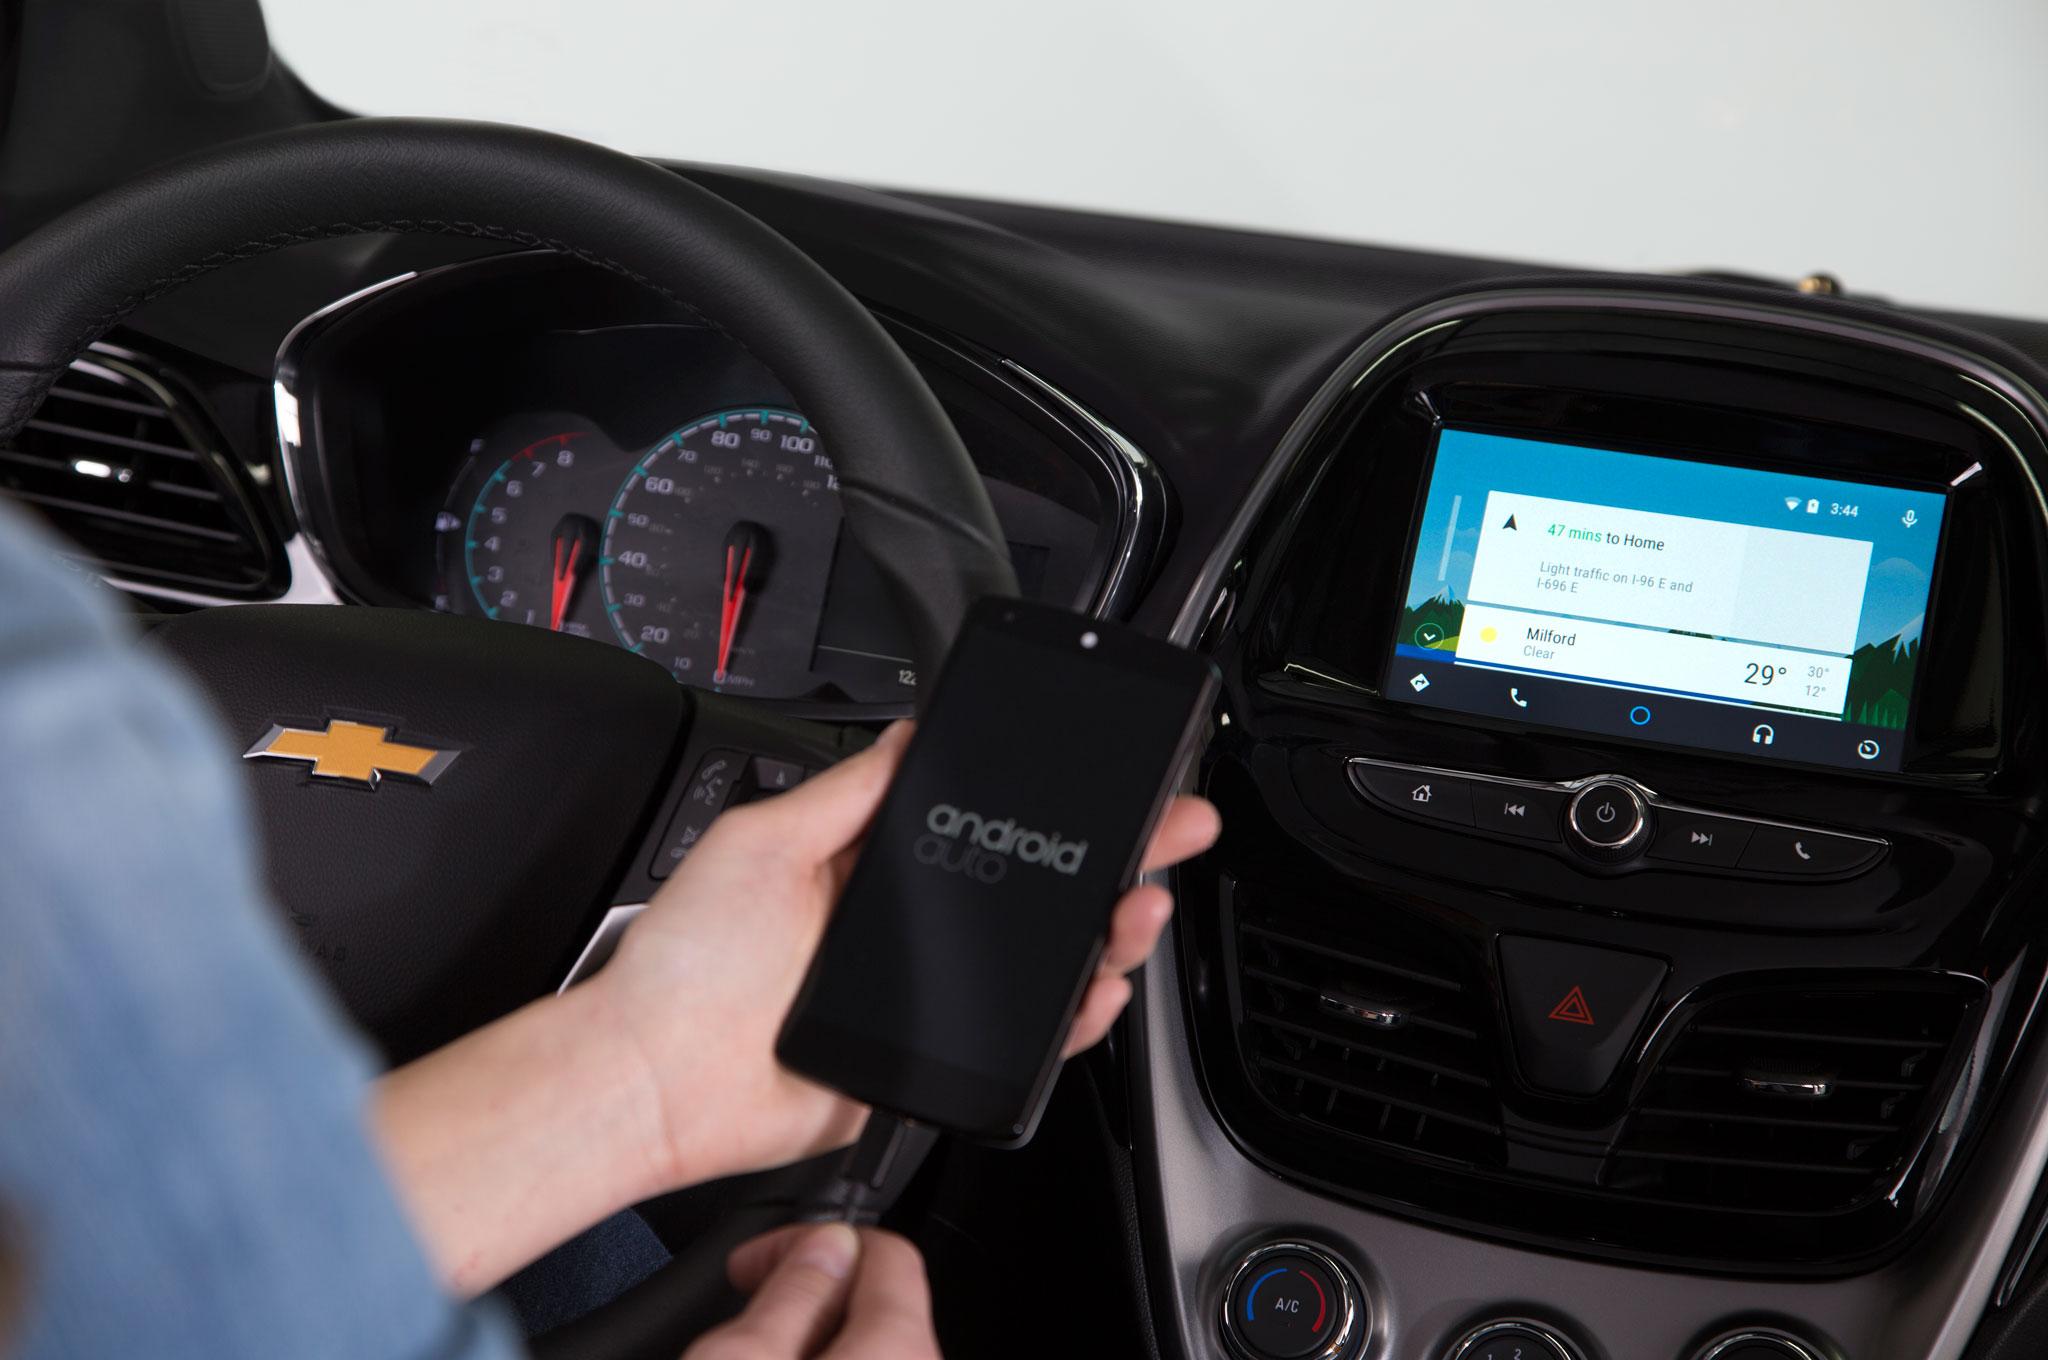 2016 Chevrolet Spark Interior Android Auto